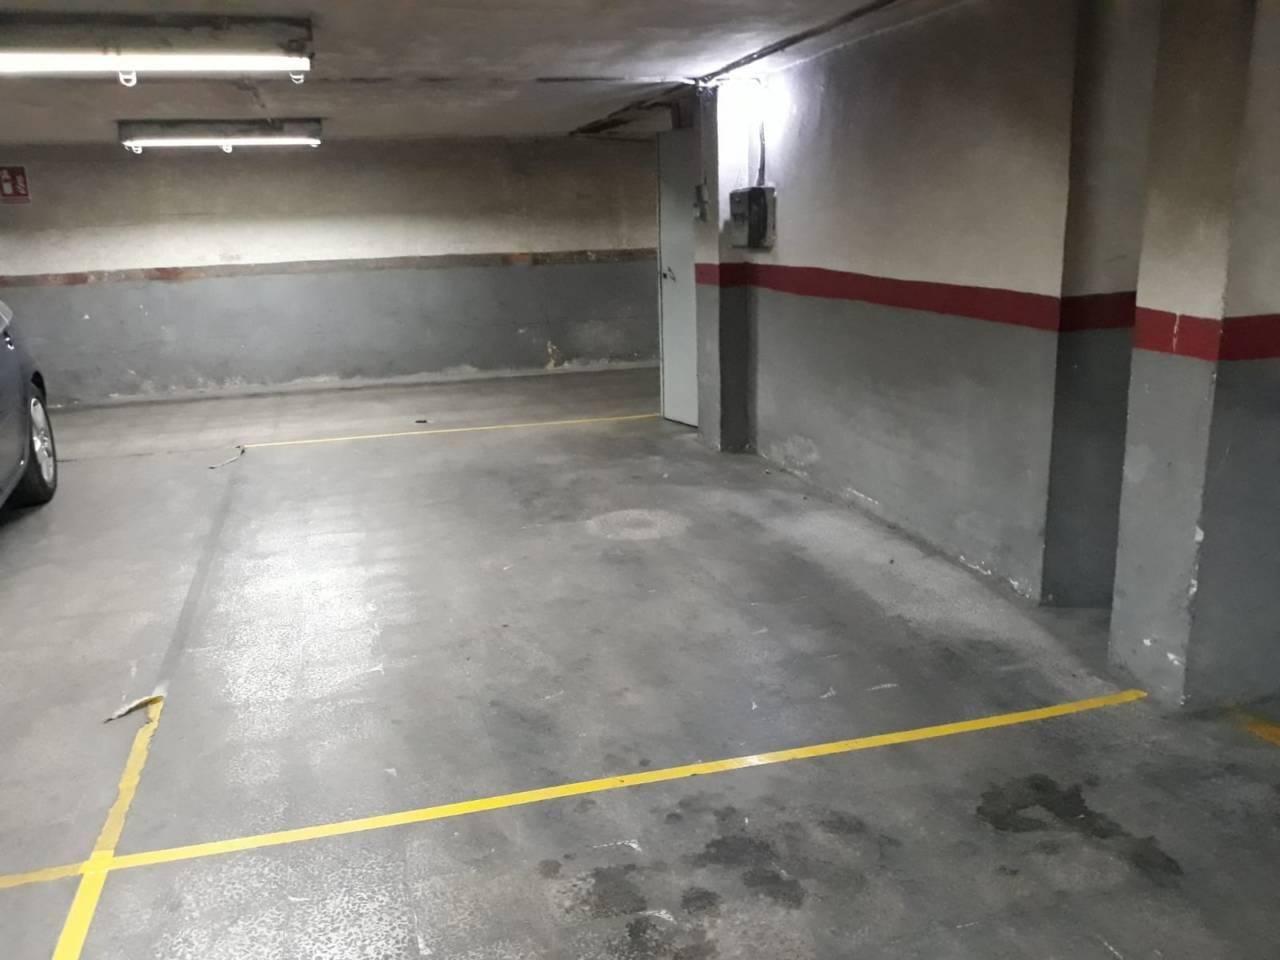 Aparcament cotxe  Carretera. Superf. 9 m², útil 9 m², 2 plazas, hay 2 plazas, cada una vale 6